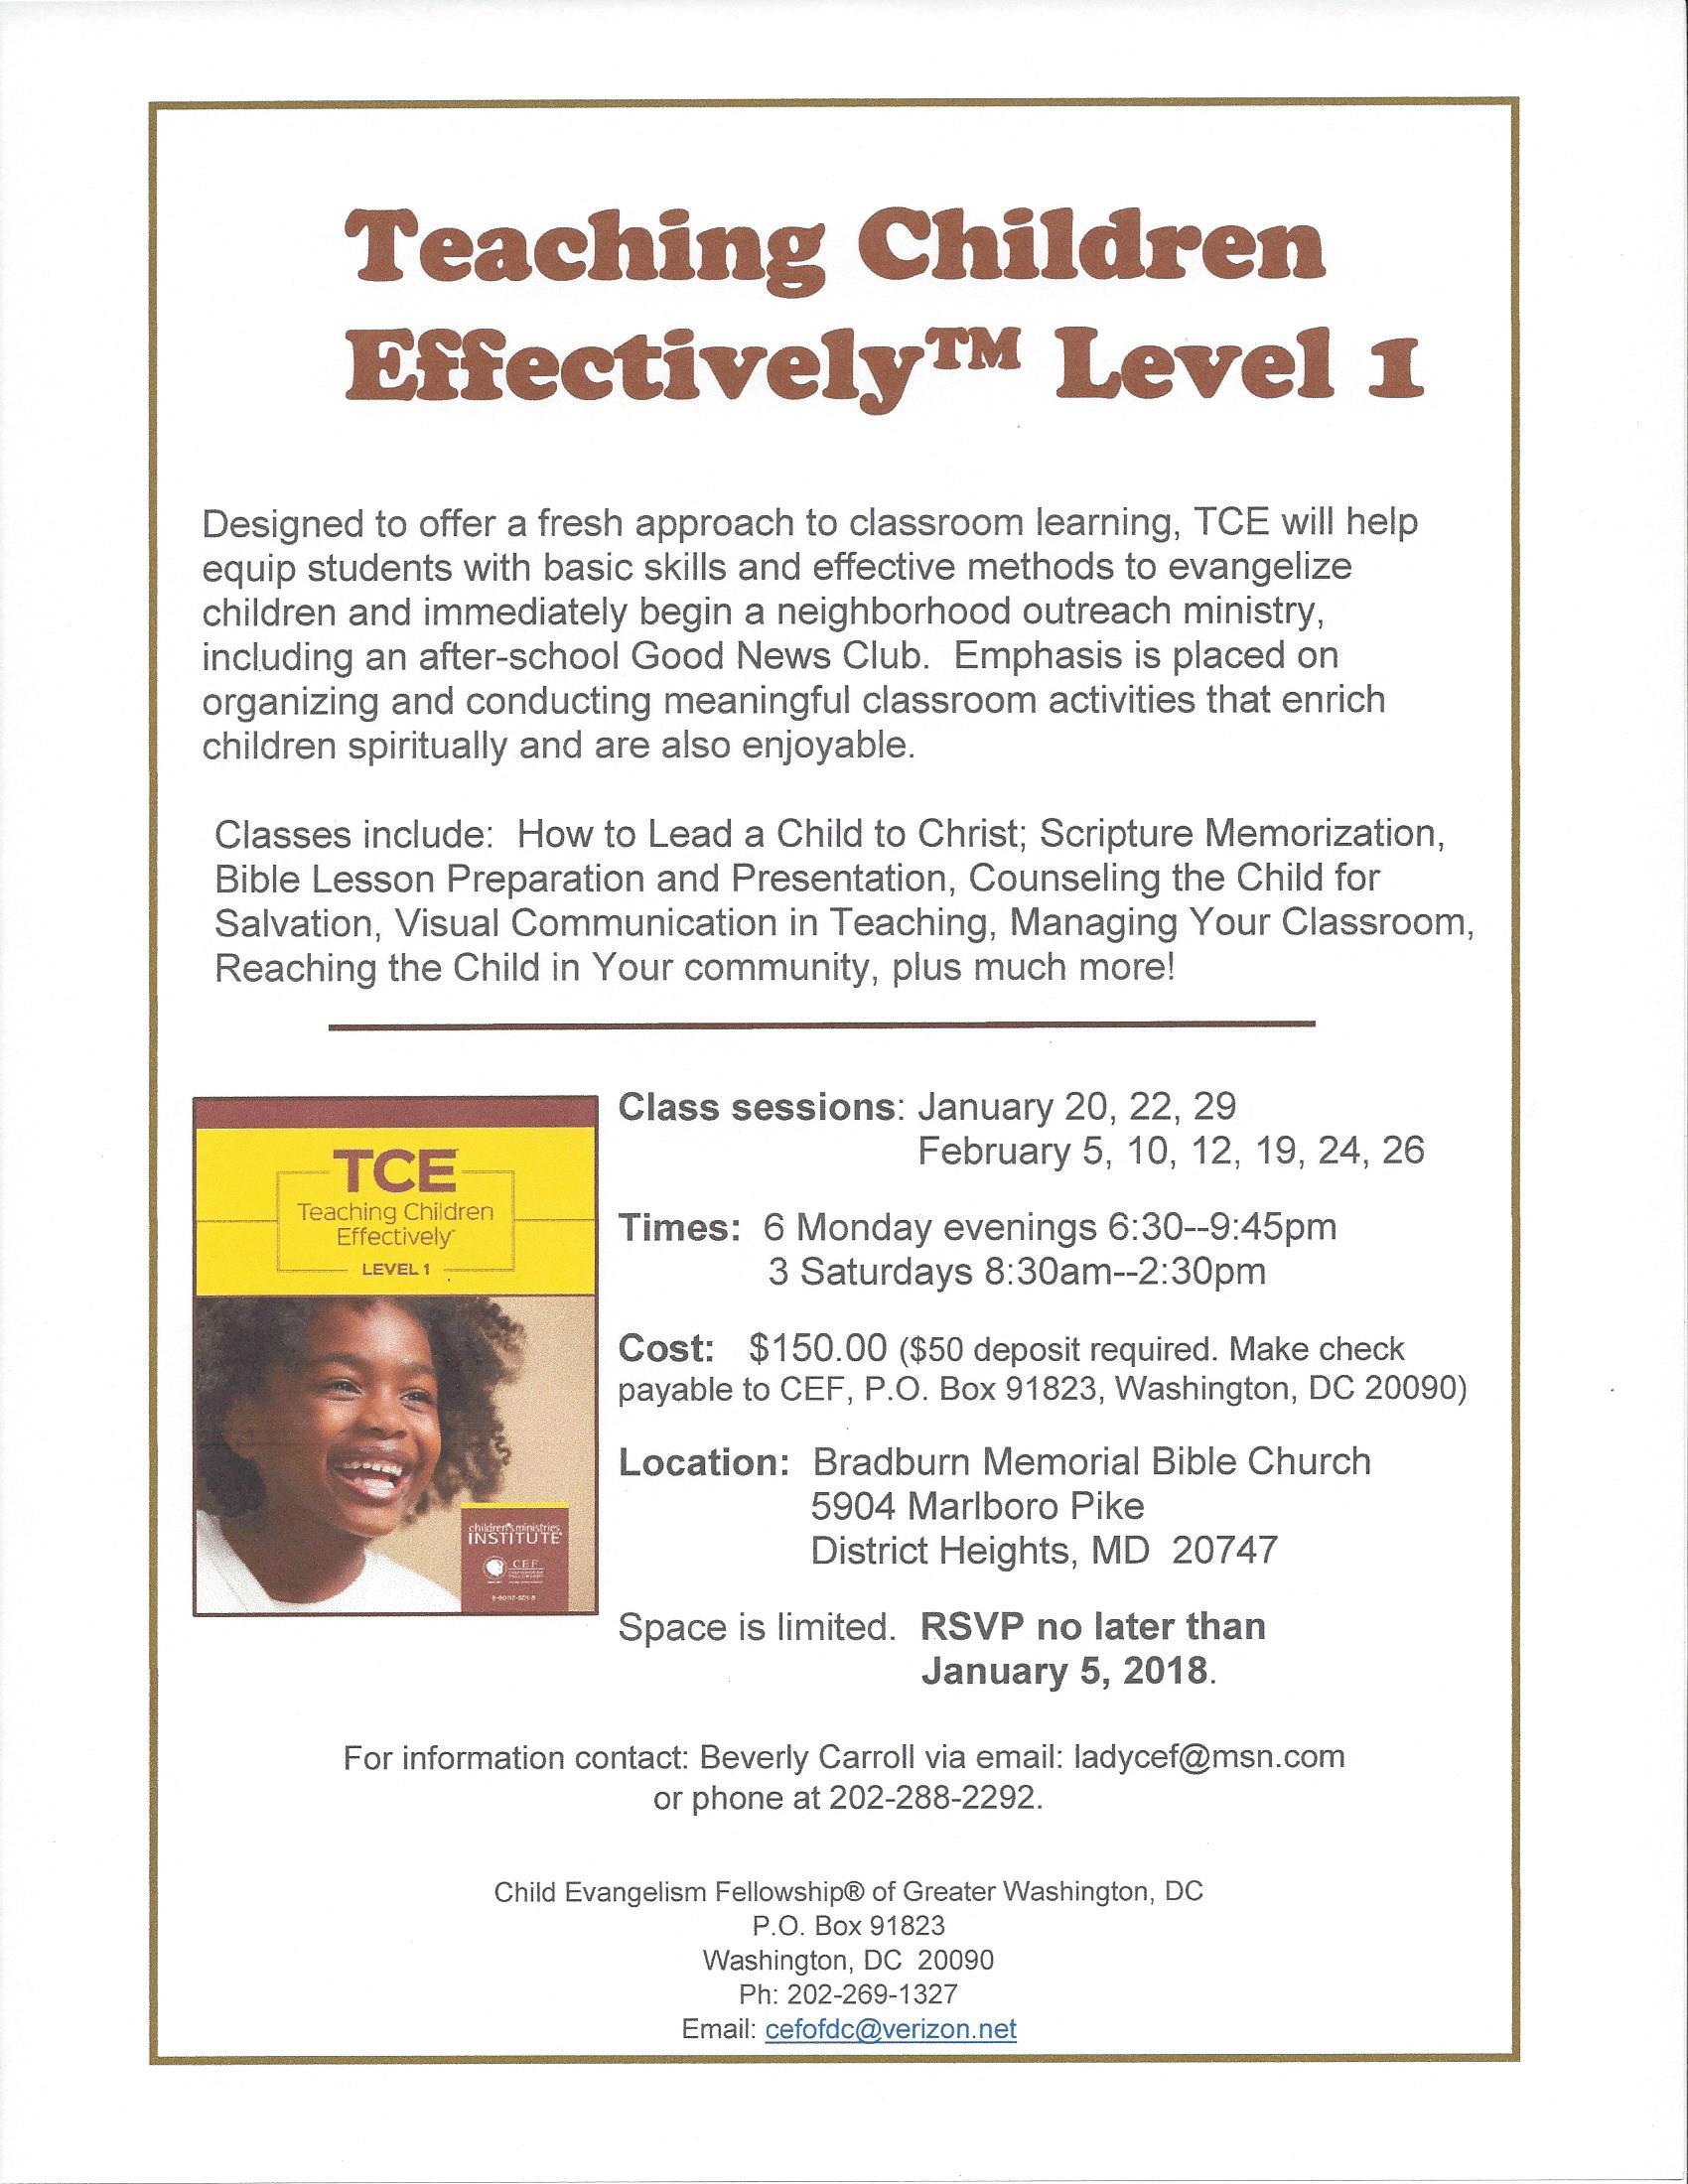 Teaching Children Effectively Level 1 Flier